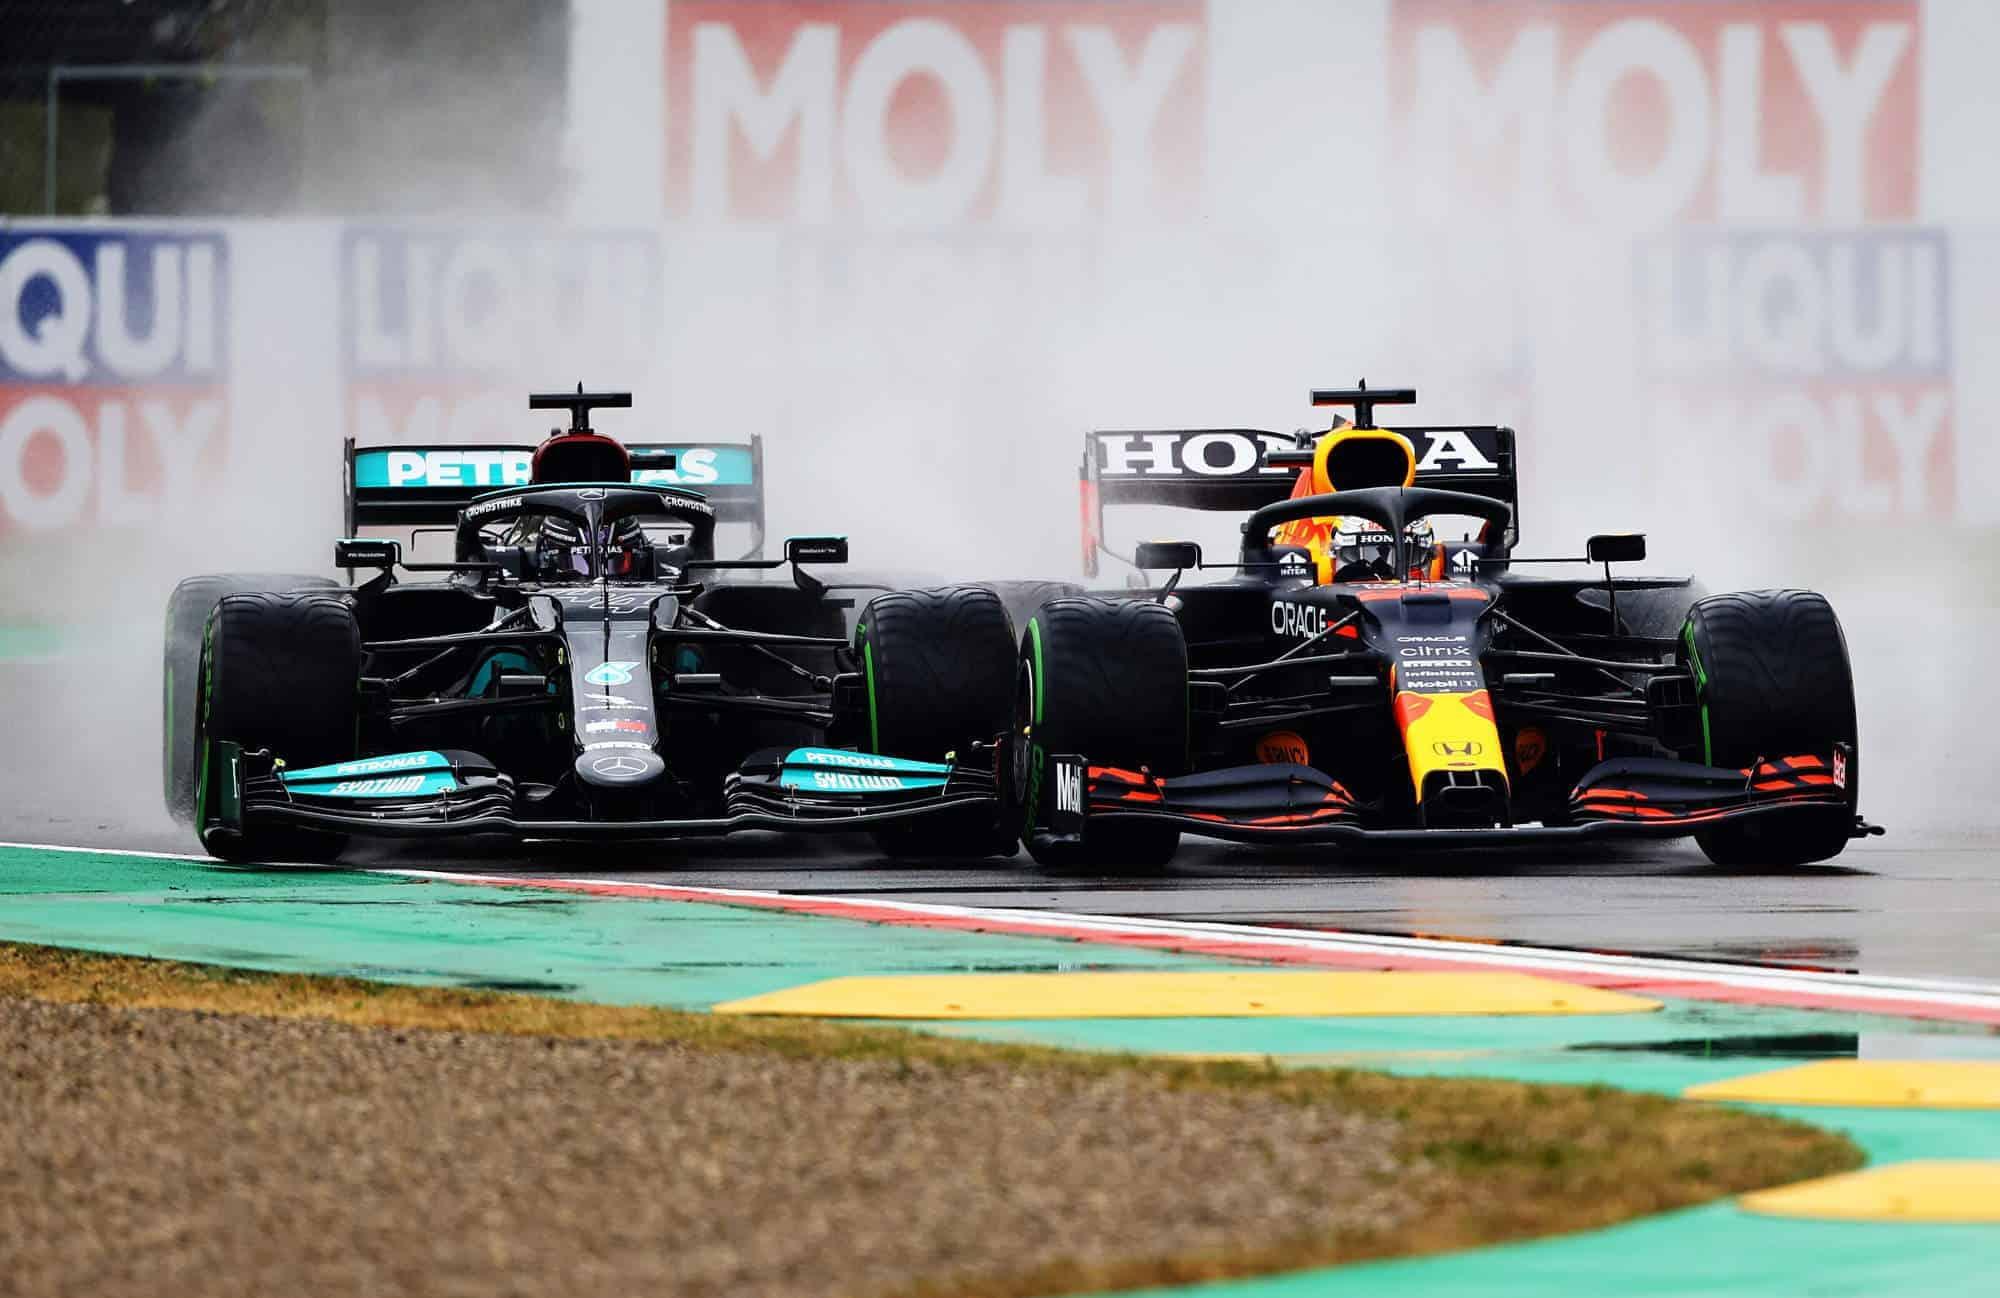 2021 Emilia Romagna GP Verstappen vs Hamilton first lap battle Photo Red Bull